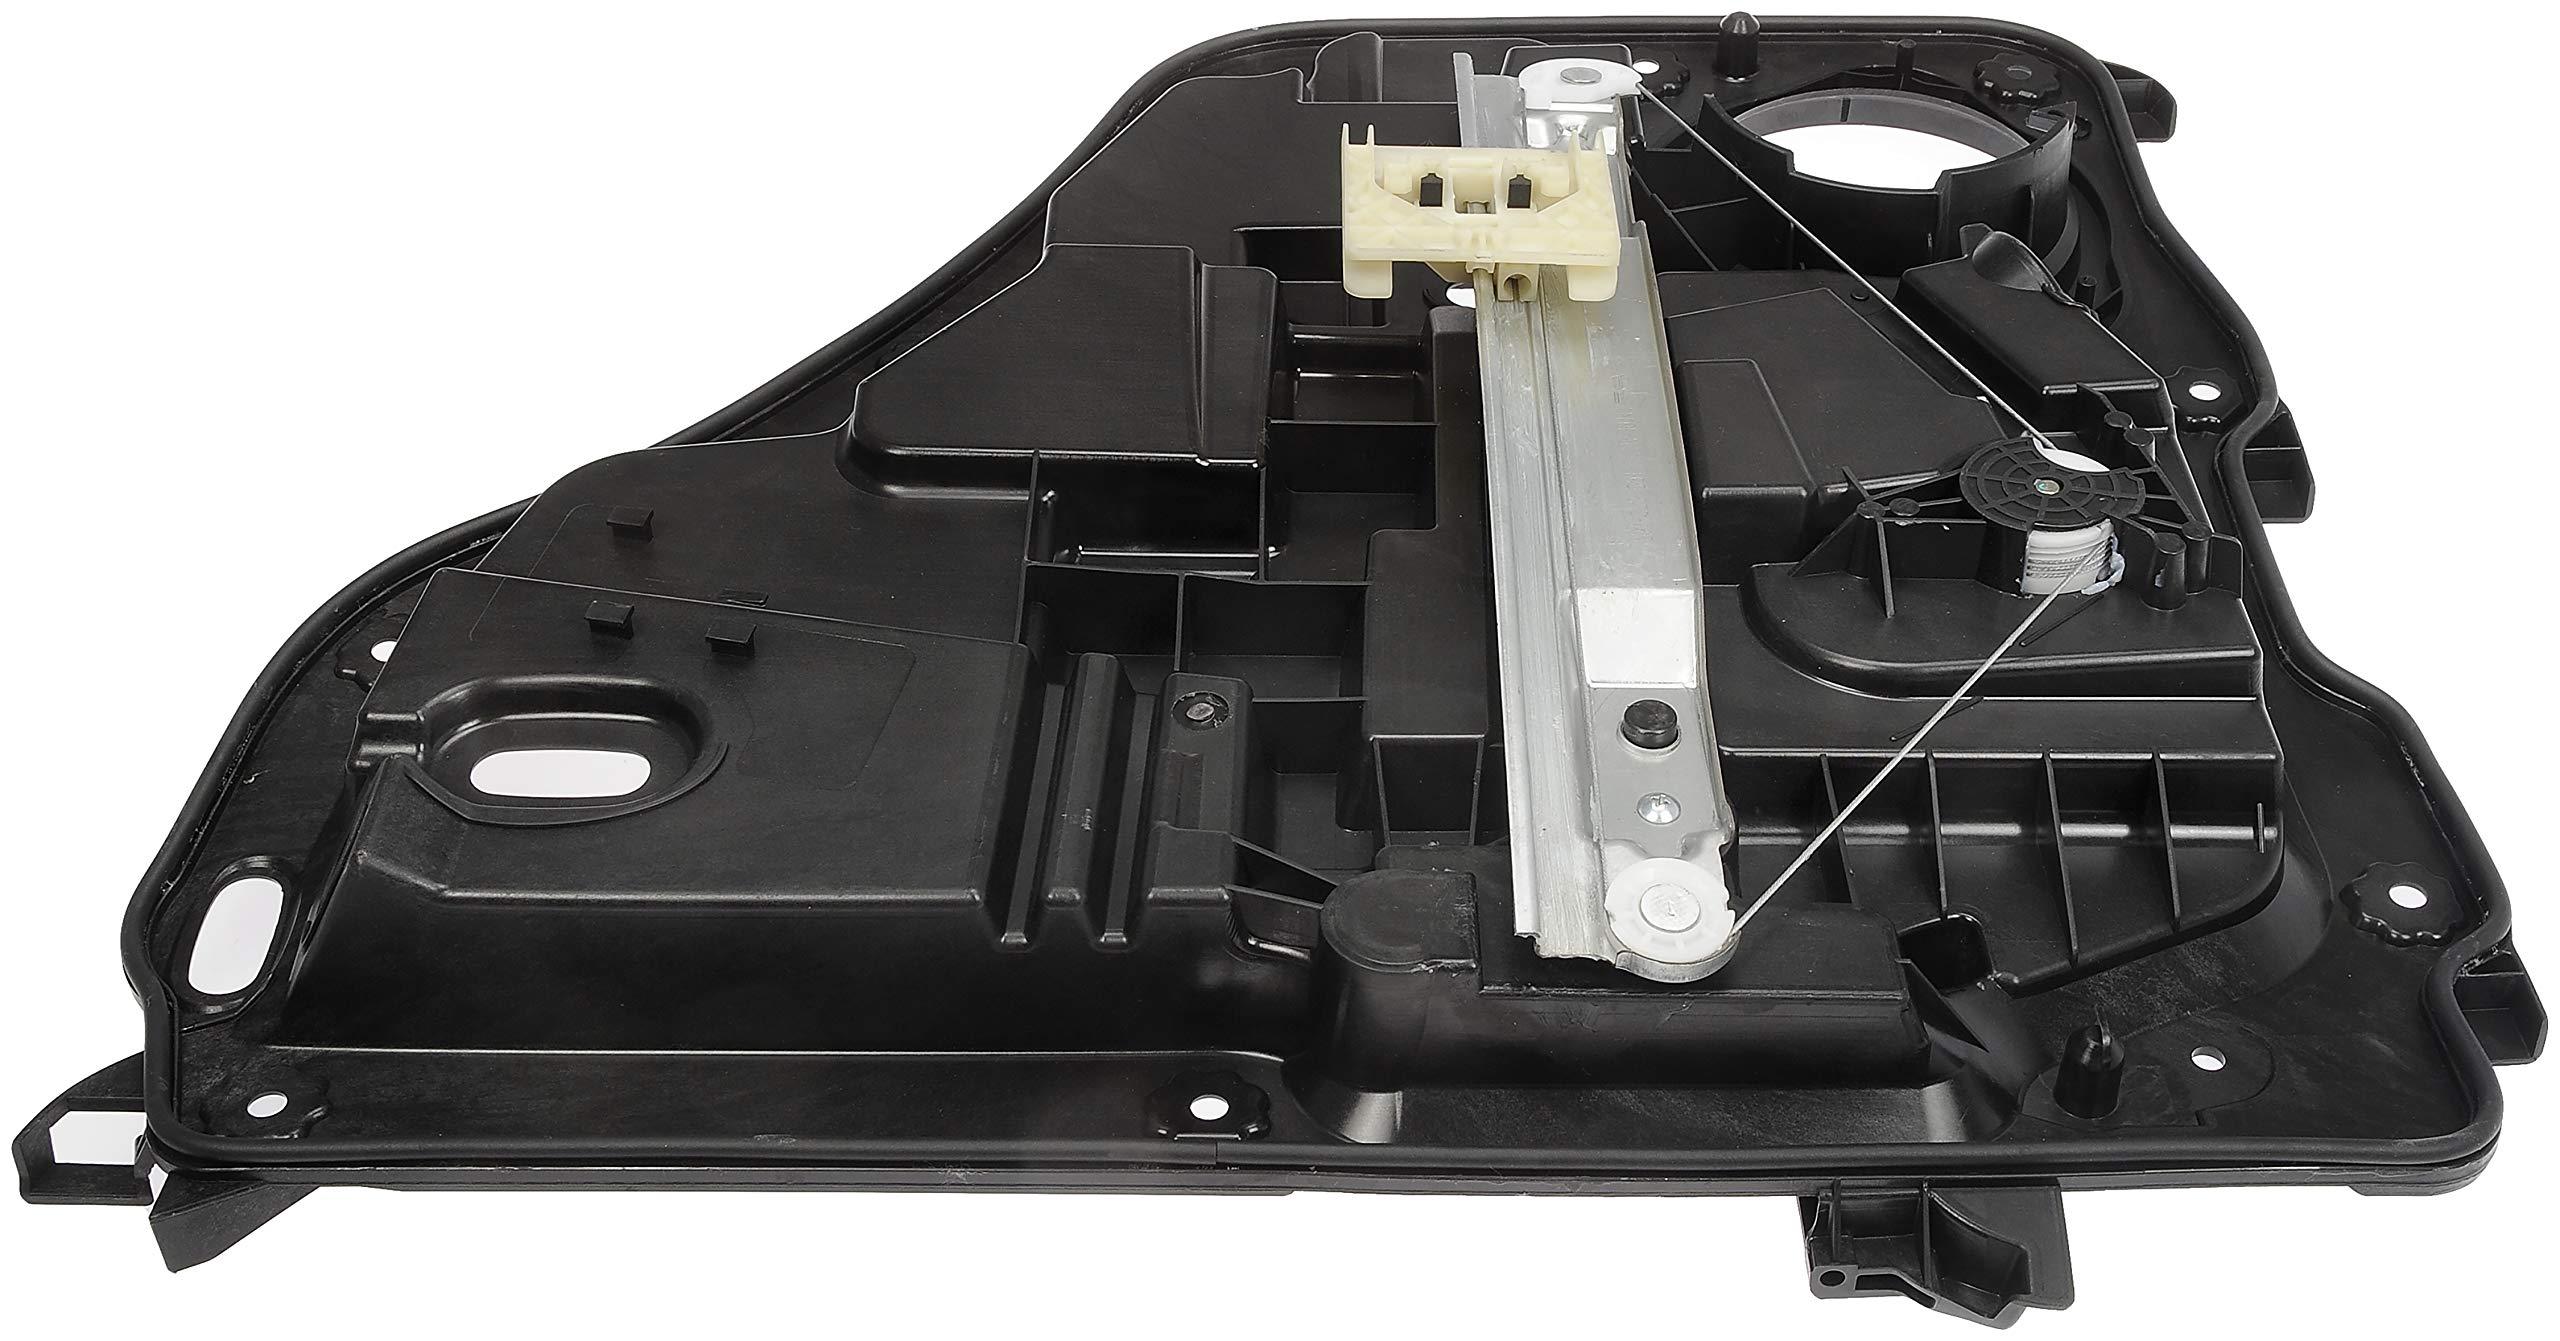 Dorman 751-272 Rear Driver Side Power Window Regulator and Motor Assembly for Select Dodge Models by Dorman